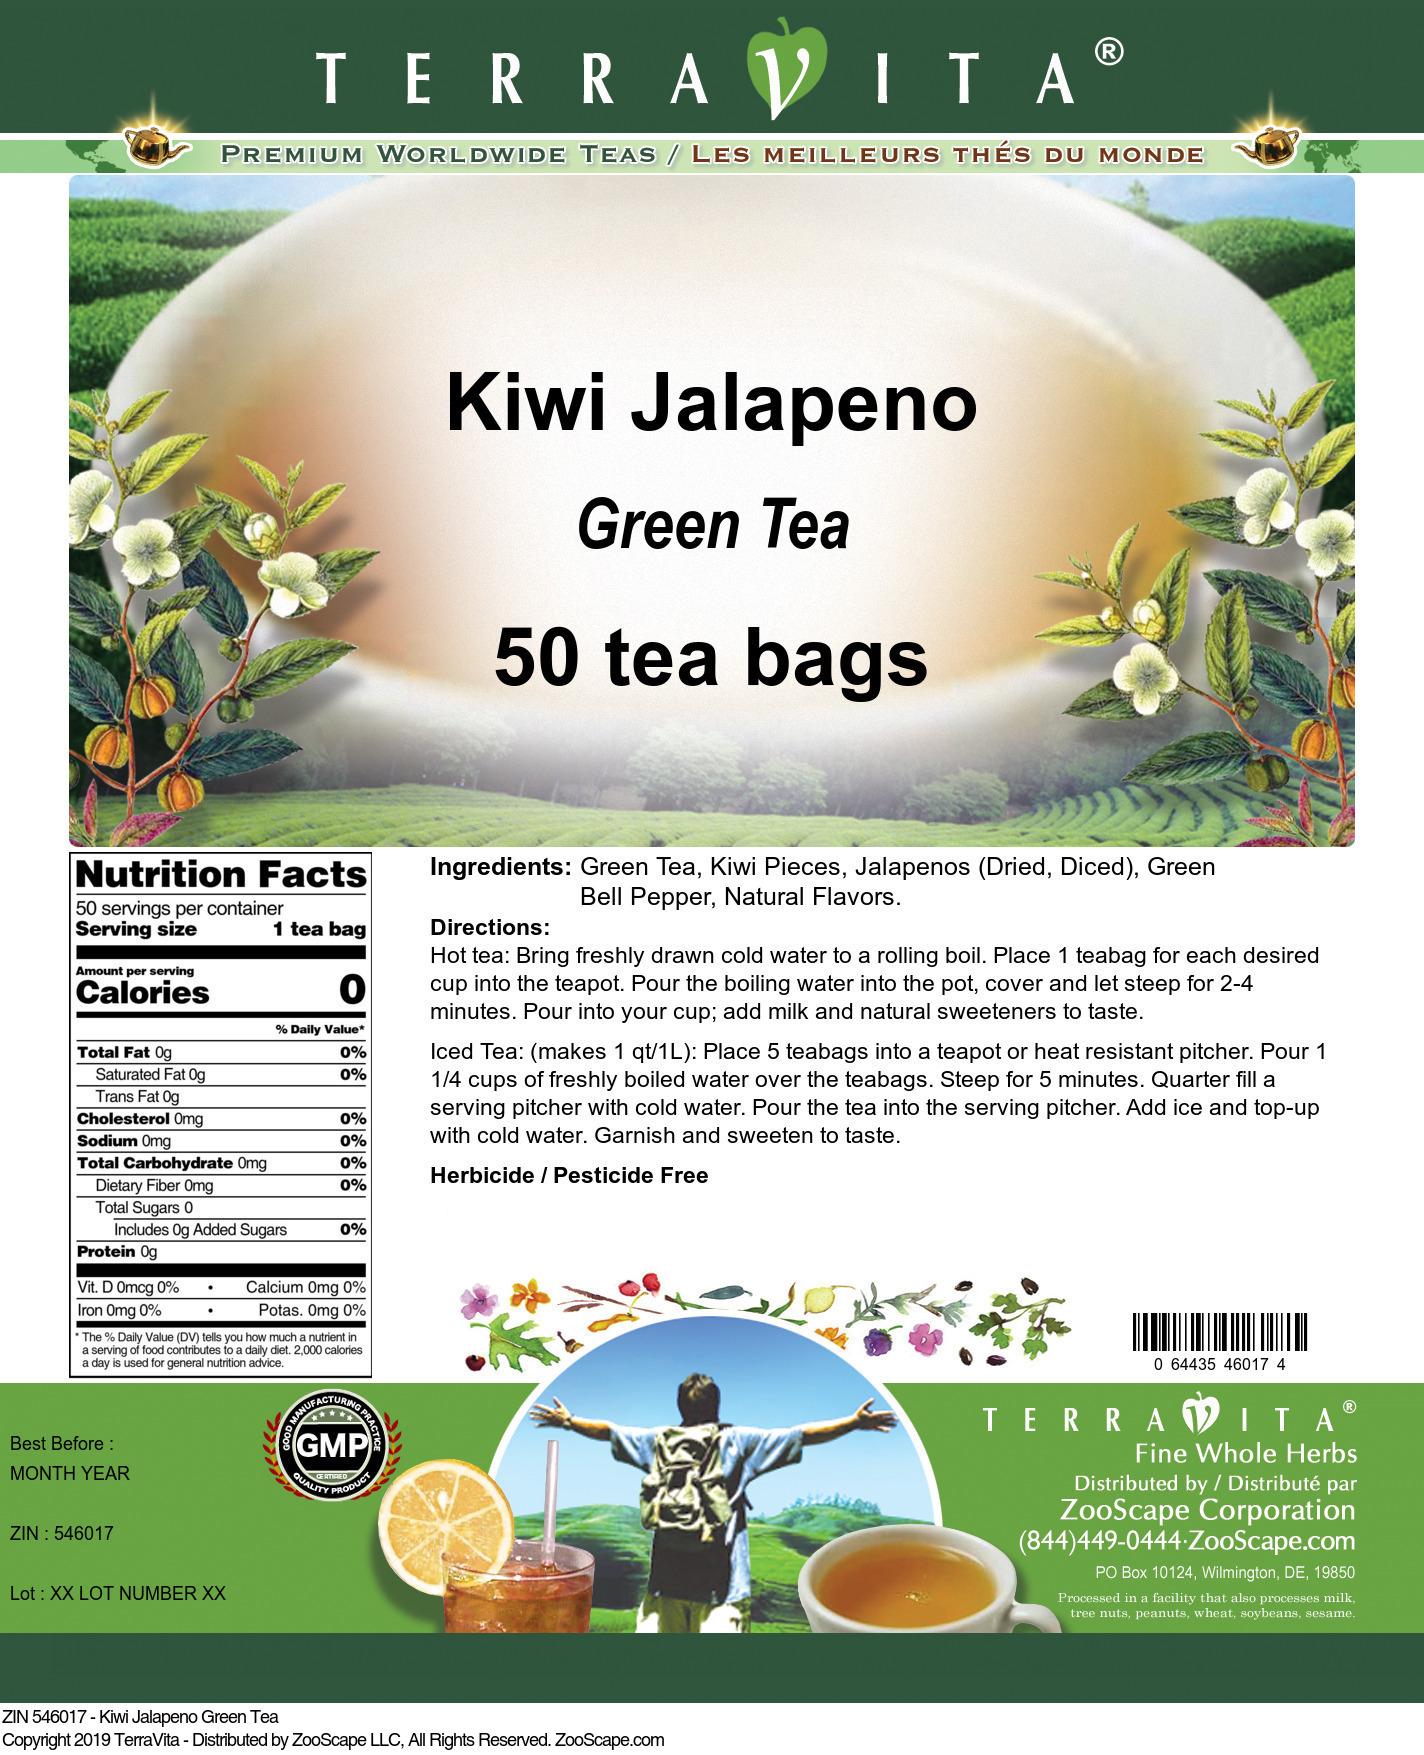 Kiwi Jalapeno Green Tea